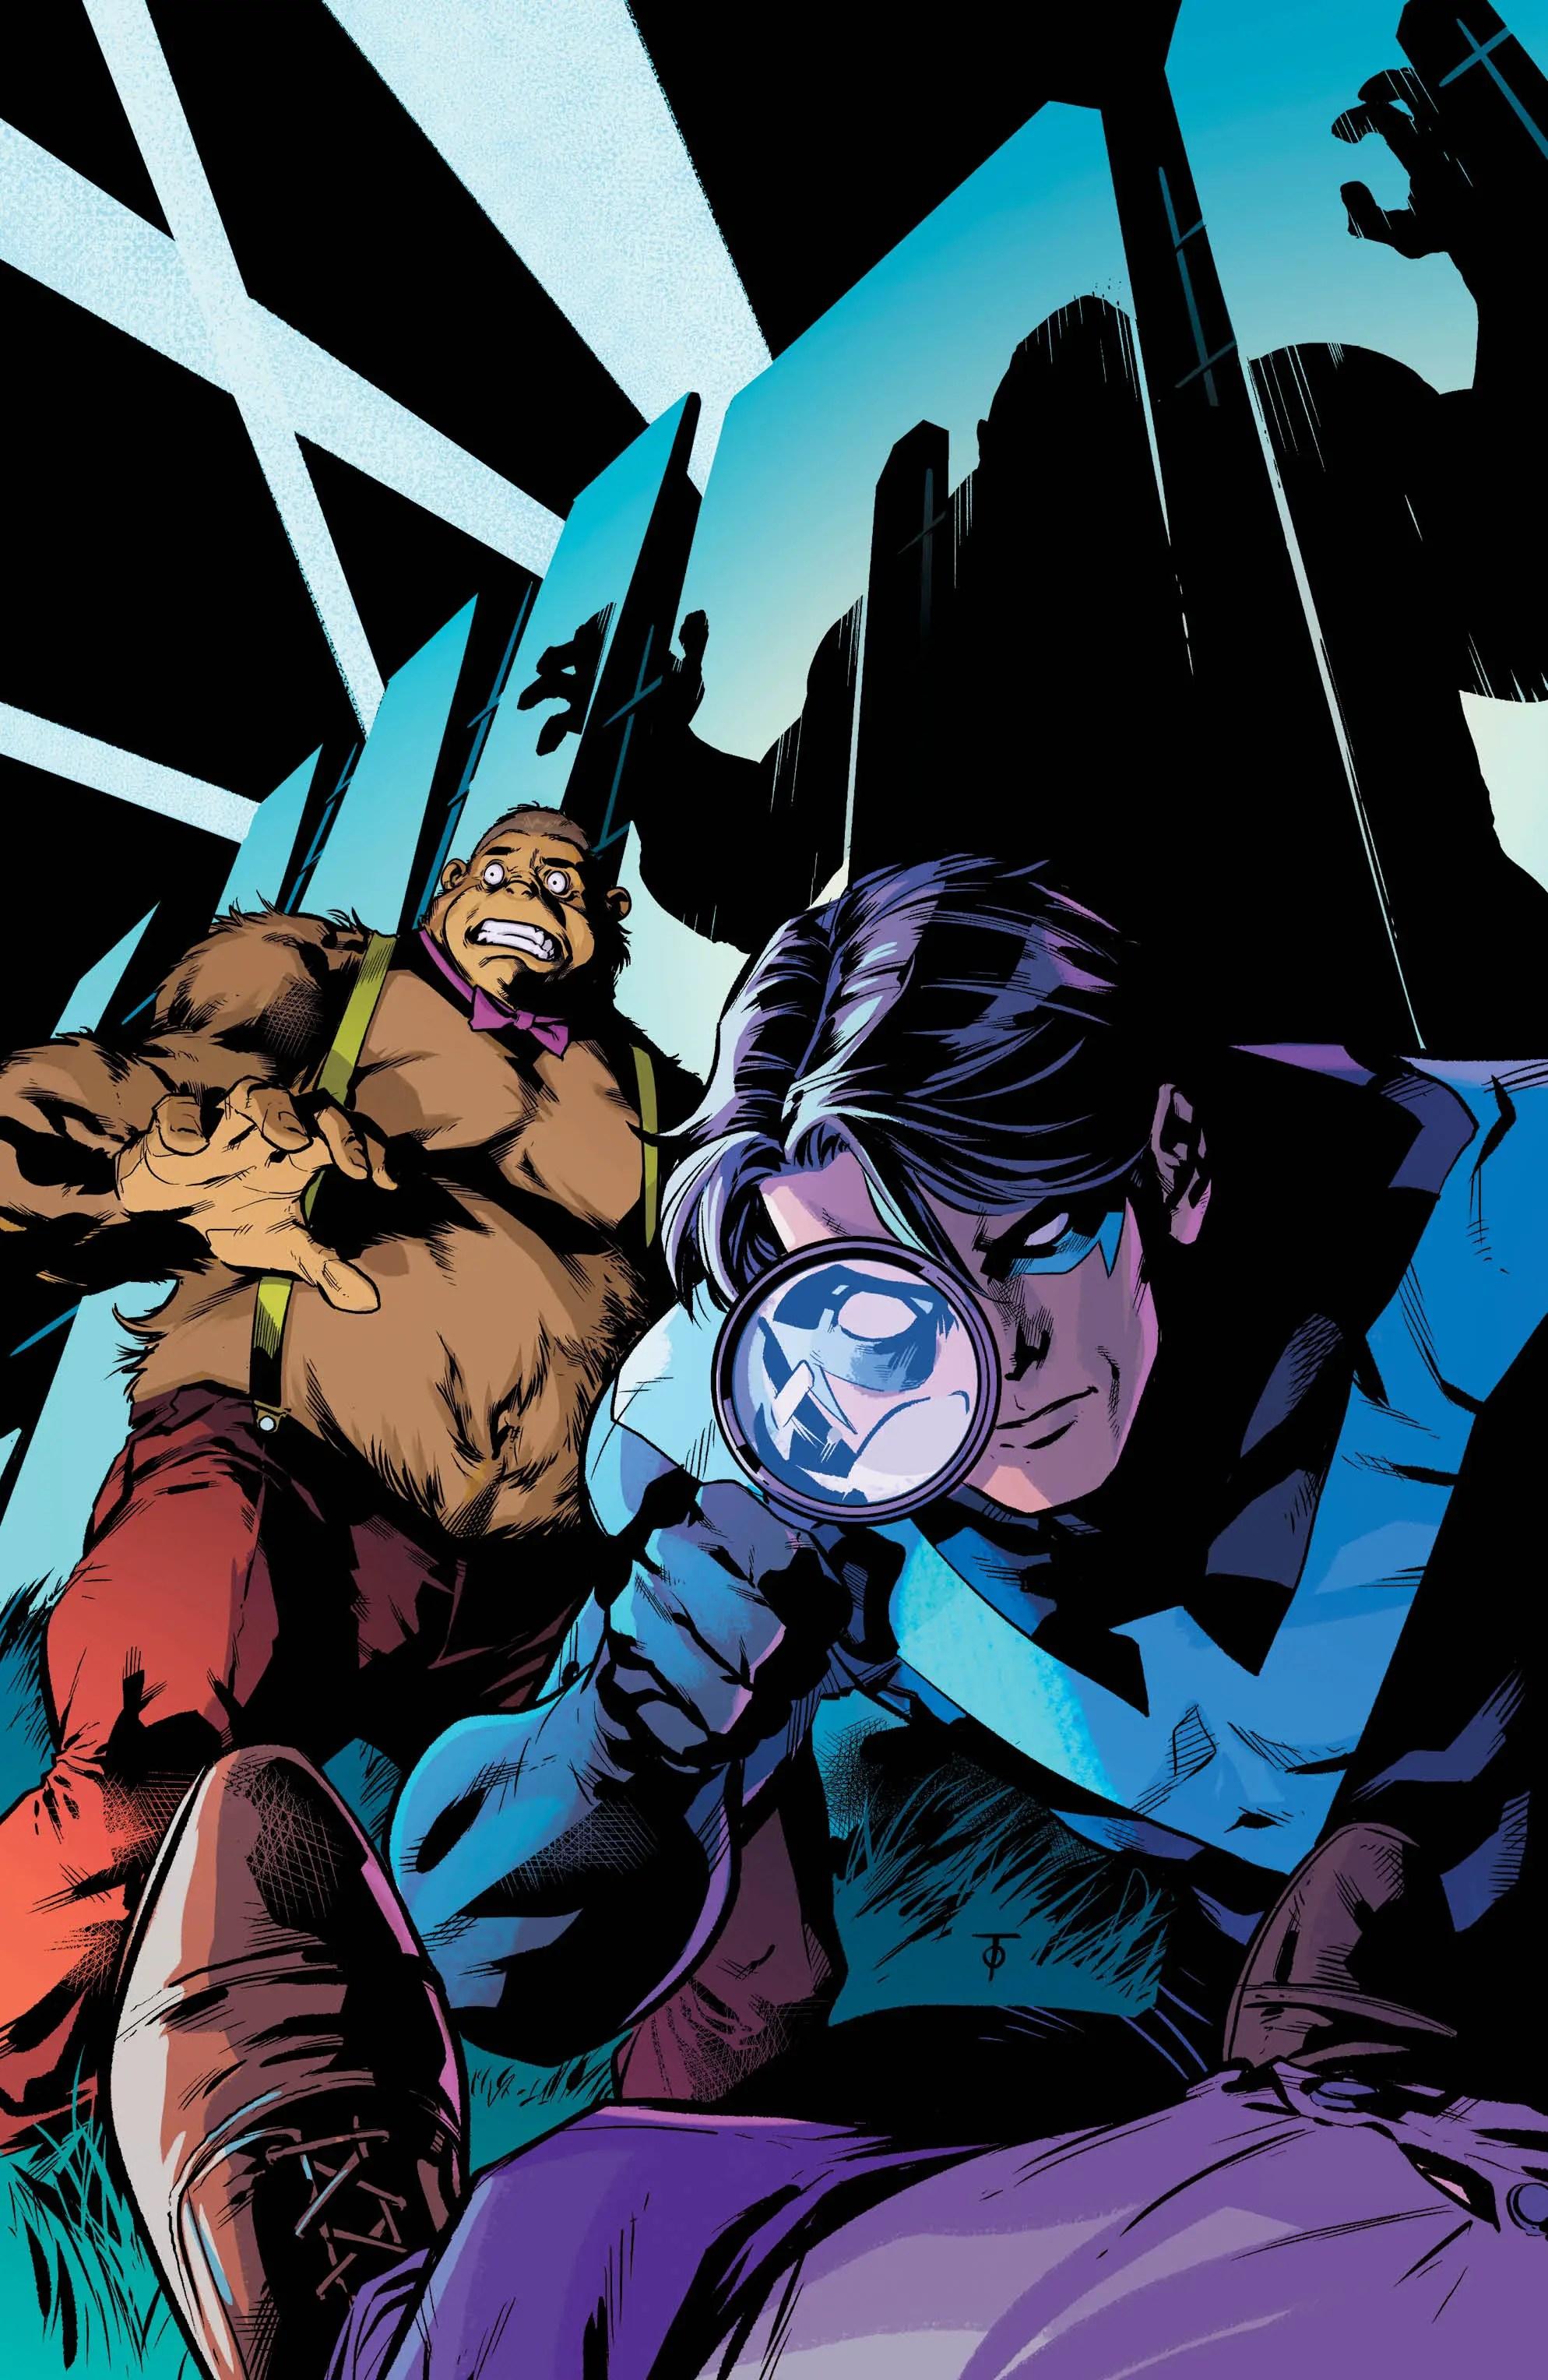 Nightwing/Magilla Gorilla #1 Review